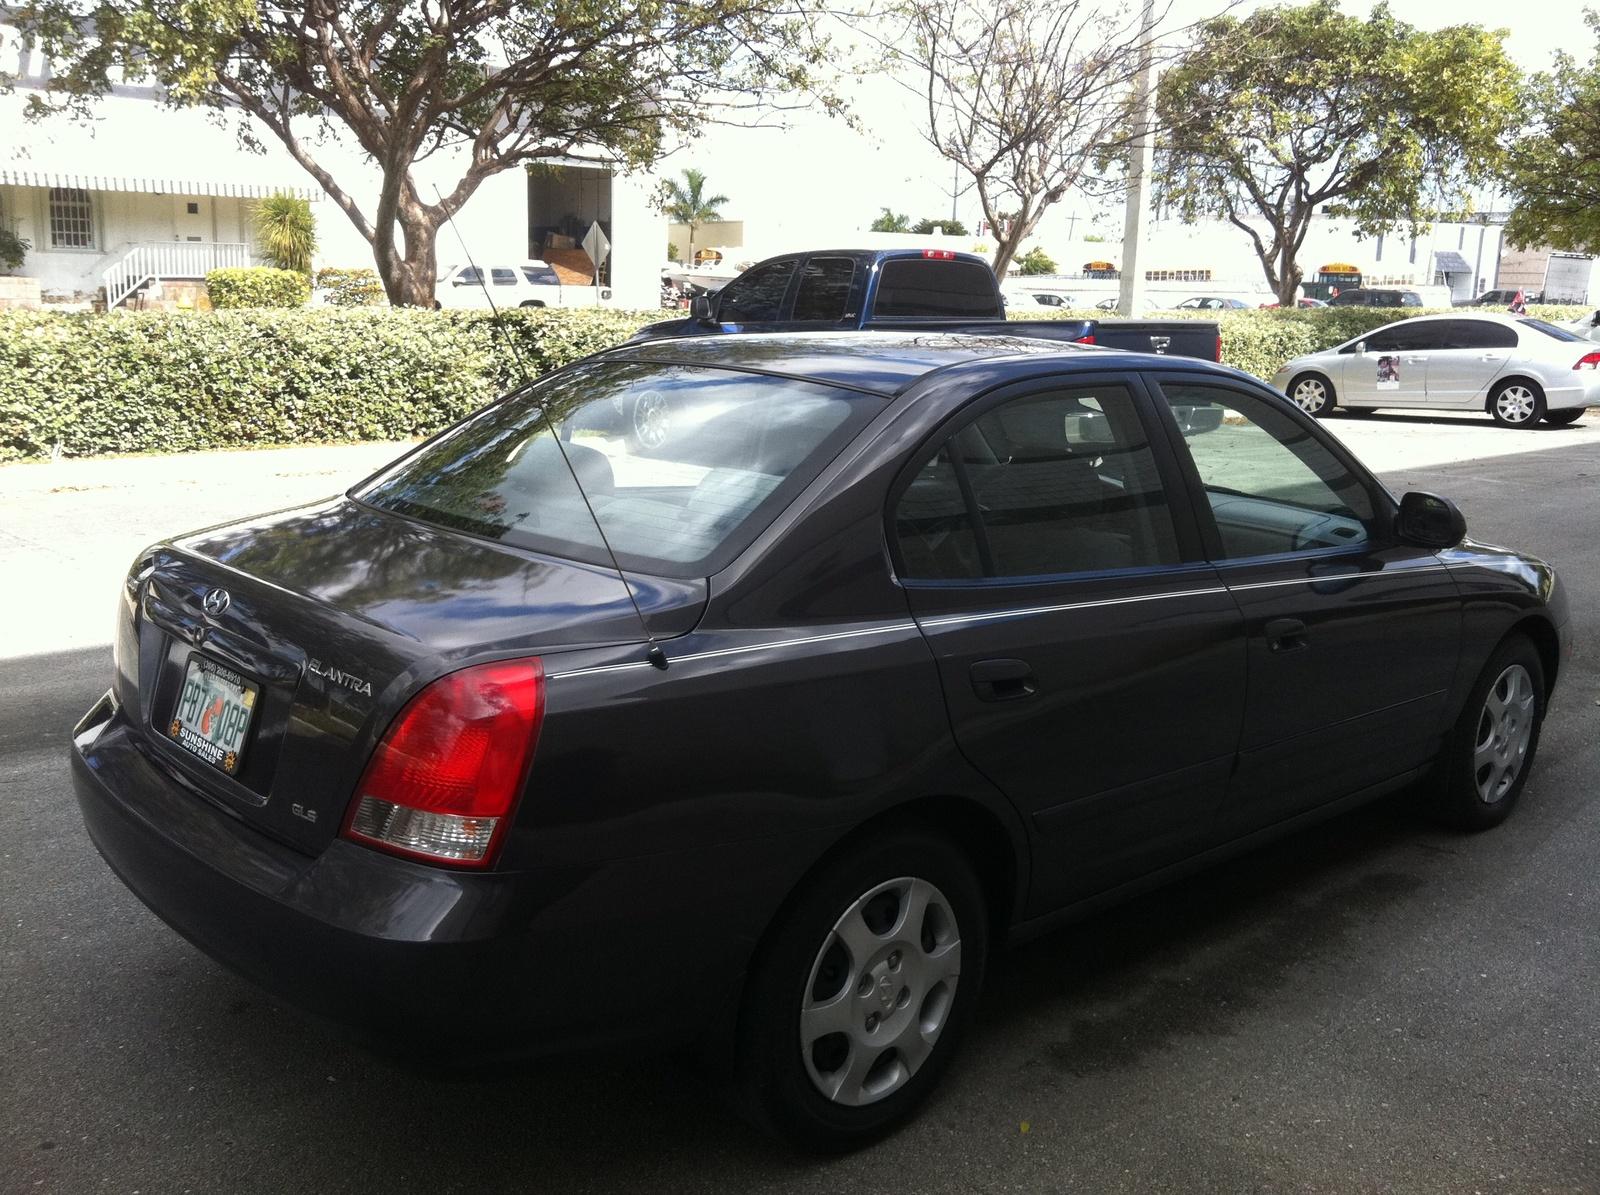 Hyundai Accent Gls Hatchback Pic furthermore Hyundai Accent Gls Pic as well Excel Hatchback furthermore Hyundai Excel besides Hyundai Accent I Hatchback Door Exterior. on 88 hyundai excel hatchback